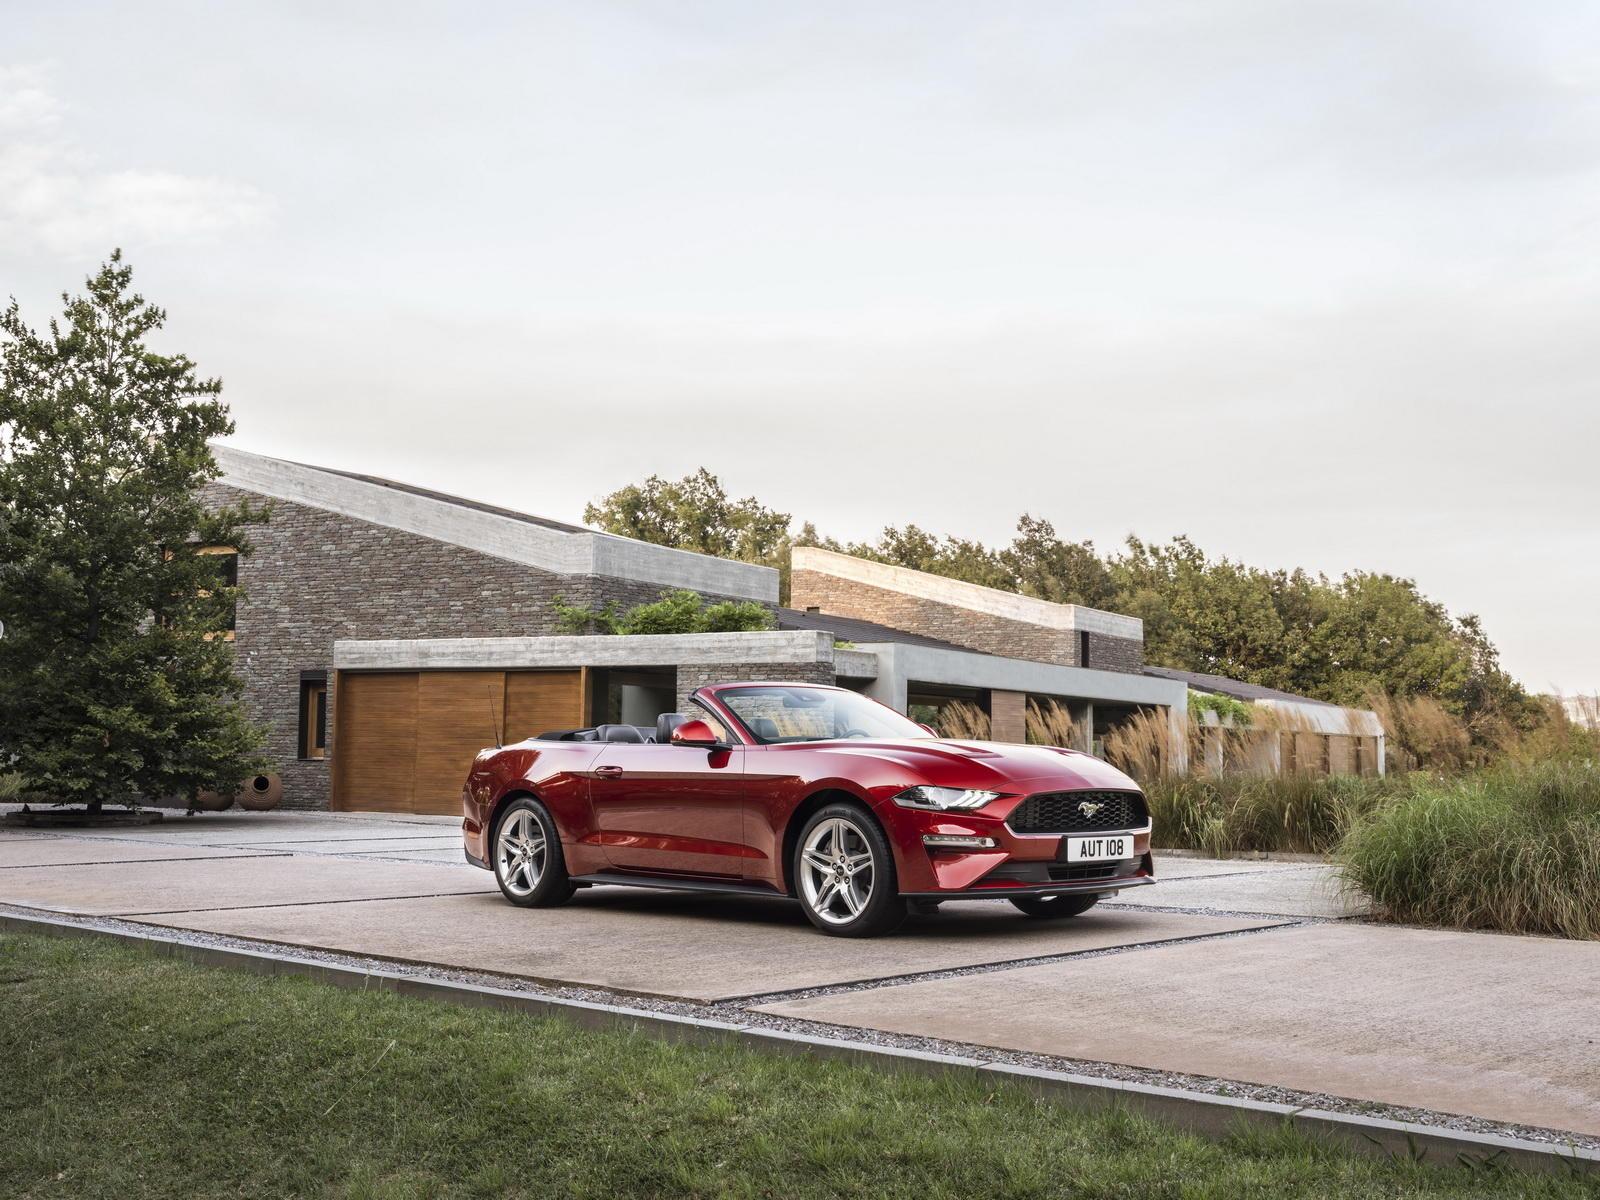 Noul Ford Mustang - Versiunea pentru Europa - Noul Ford Mustang - Versiunea pentru Europa